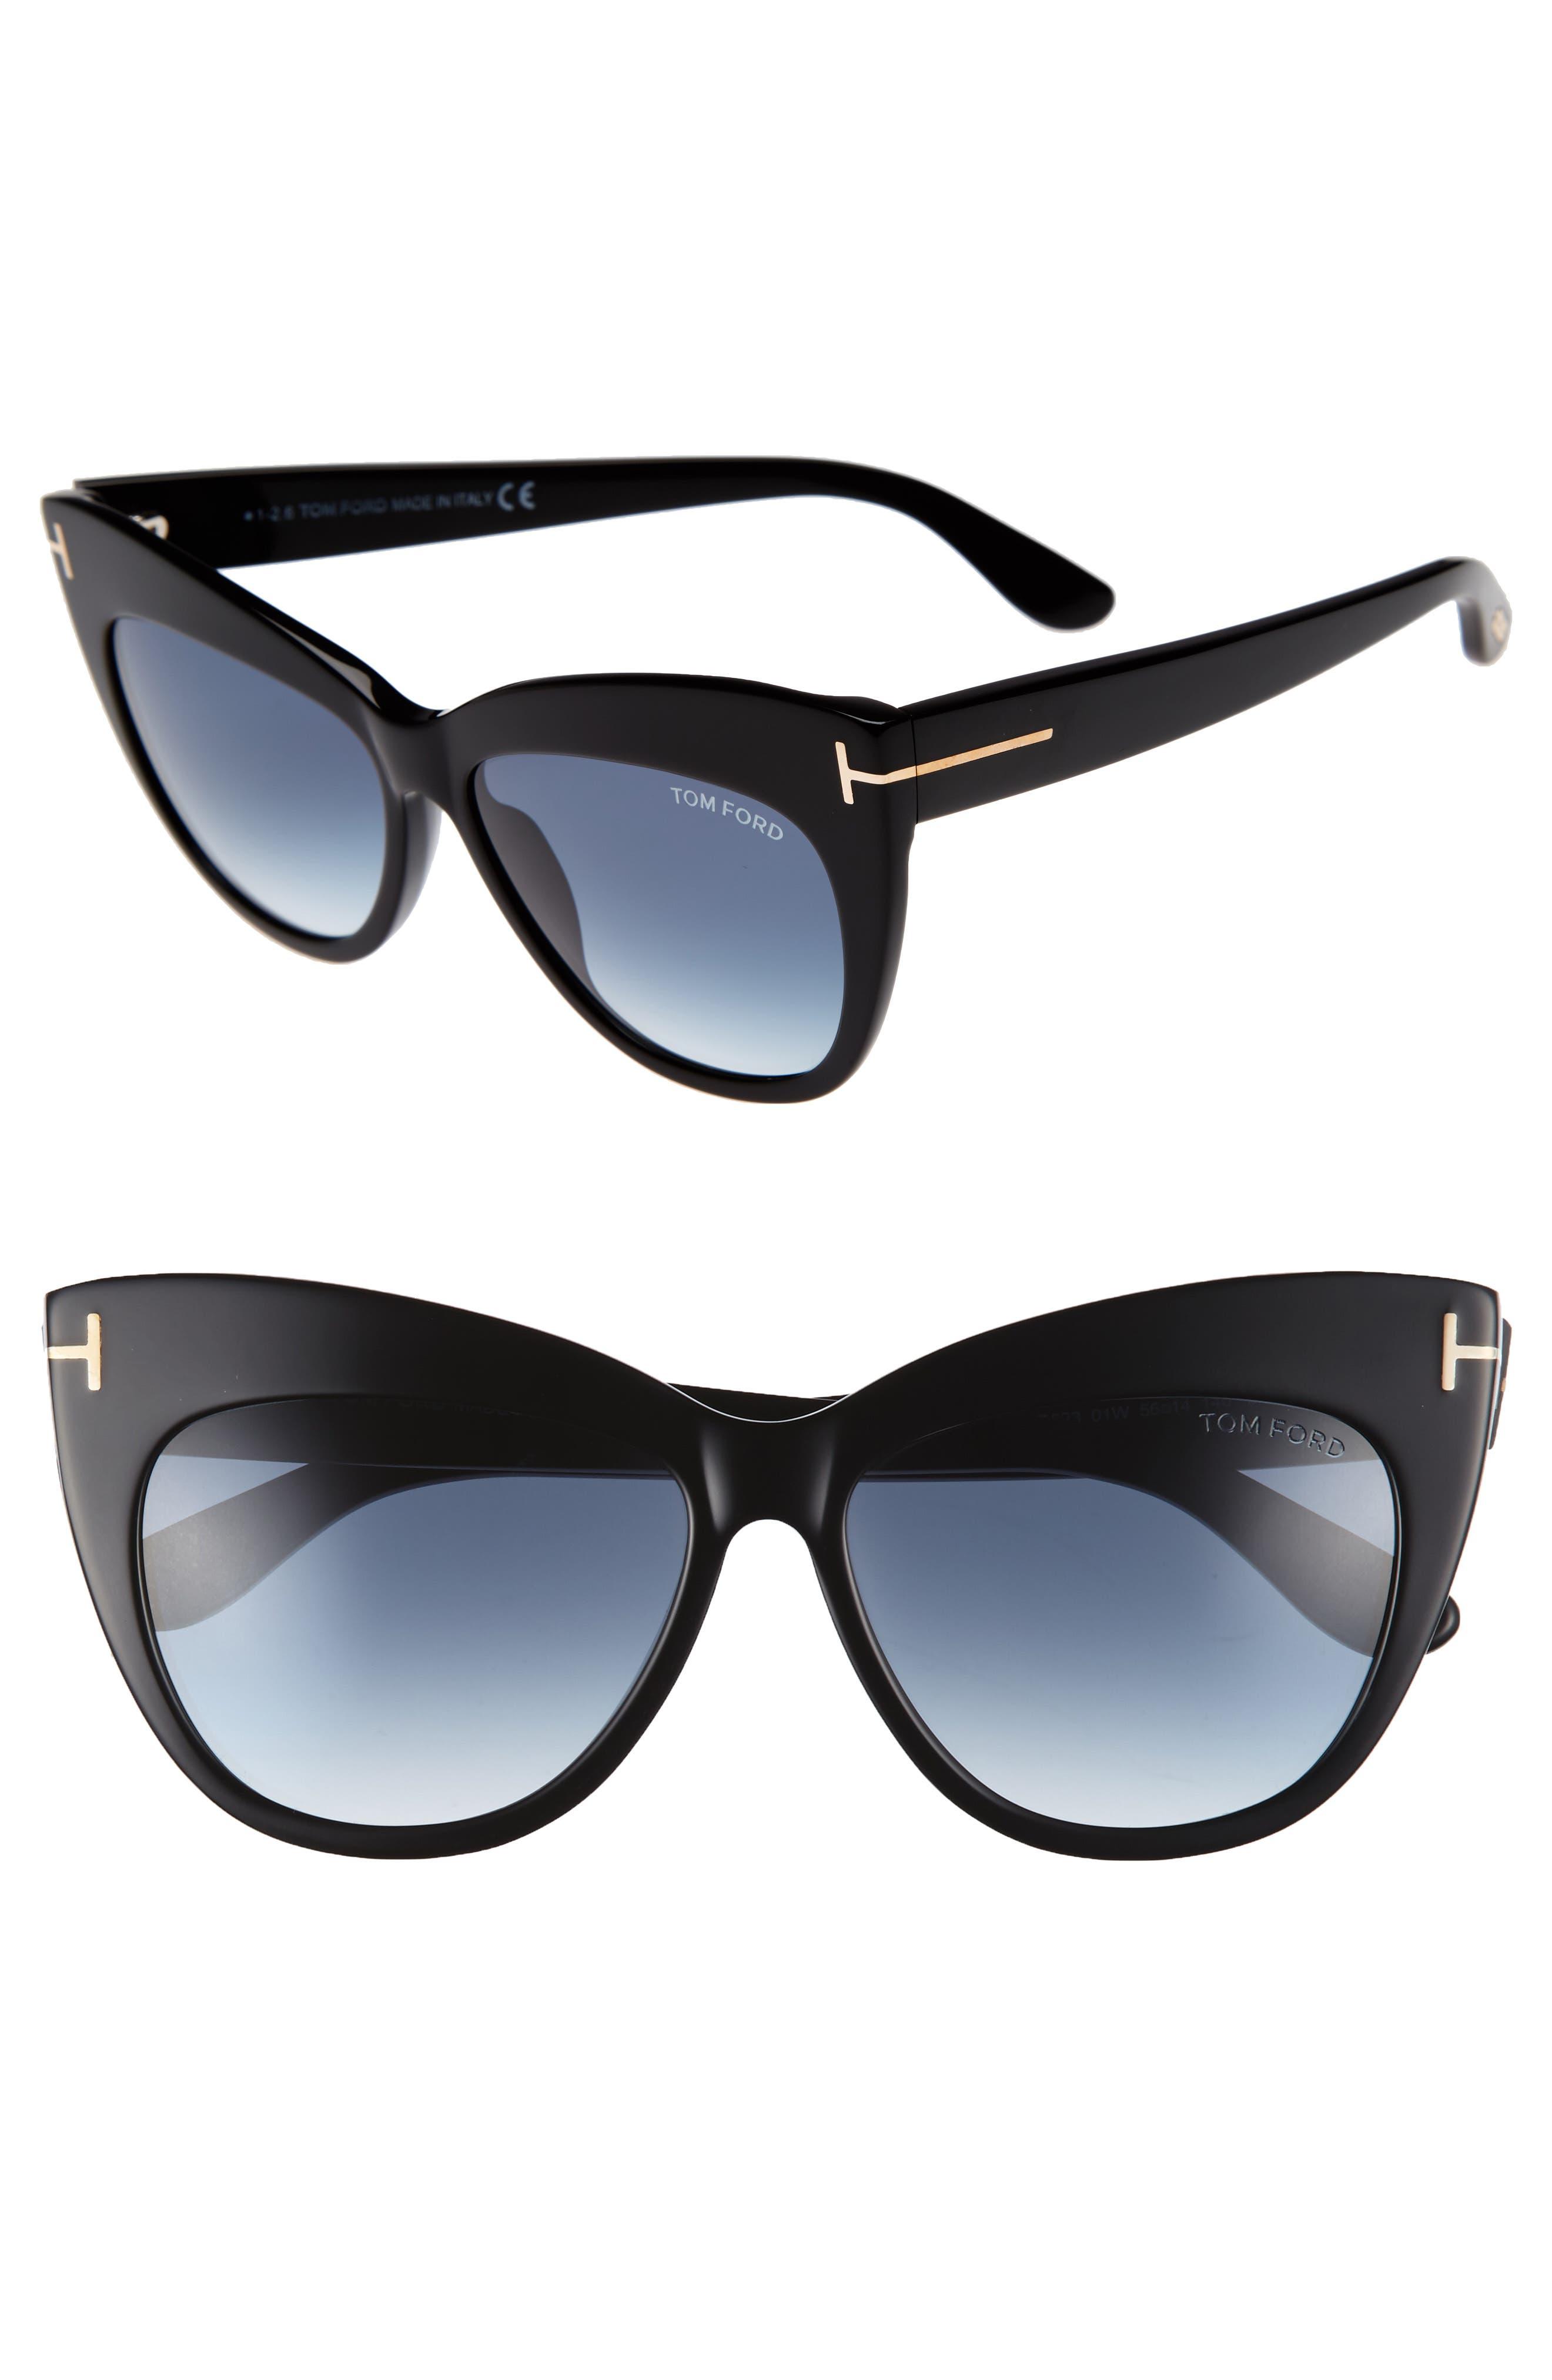 Main Image - Tom Ford Nika 56mm Gradient Cat Eye Sunglasses